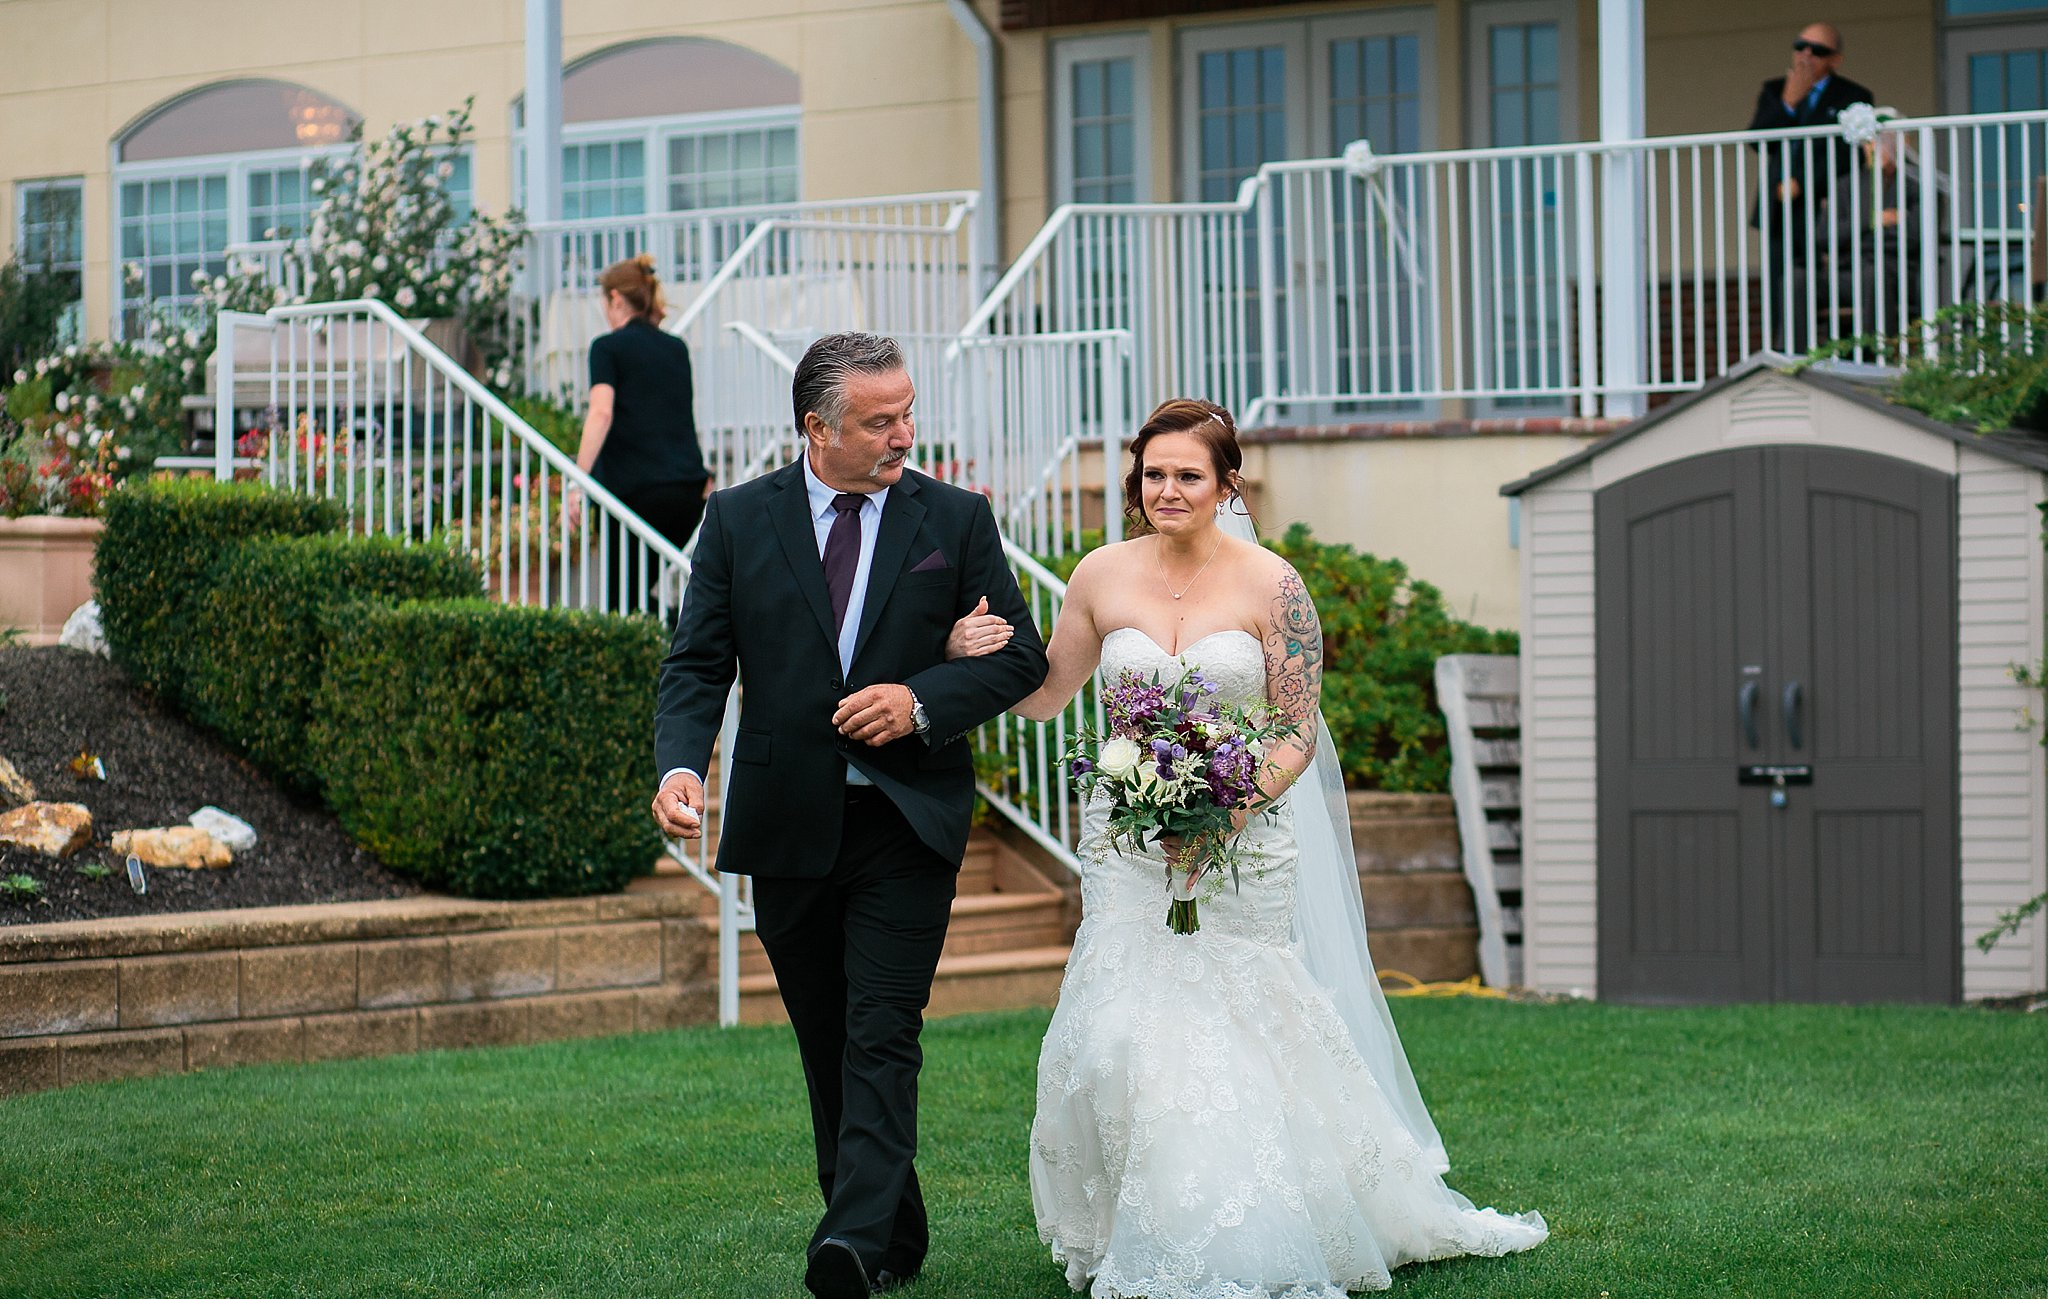 Links at Unionvale Wedding Lagrangeville Wedding Hudson Valley Wedding Photographer Sweet Alice Photography24.jpg